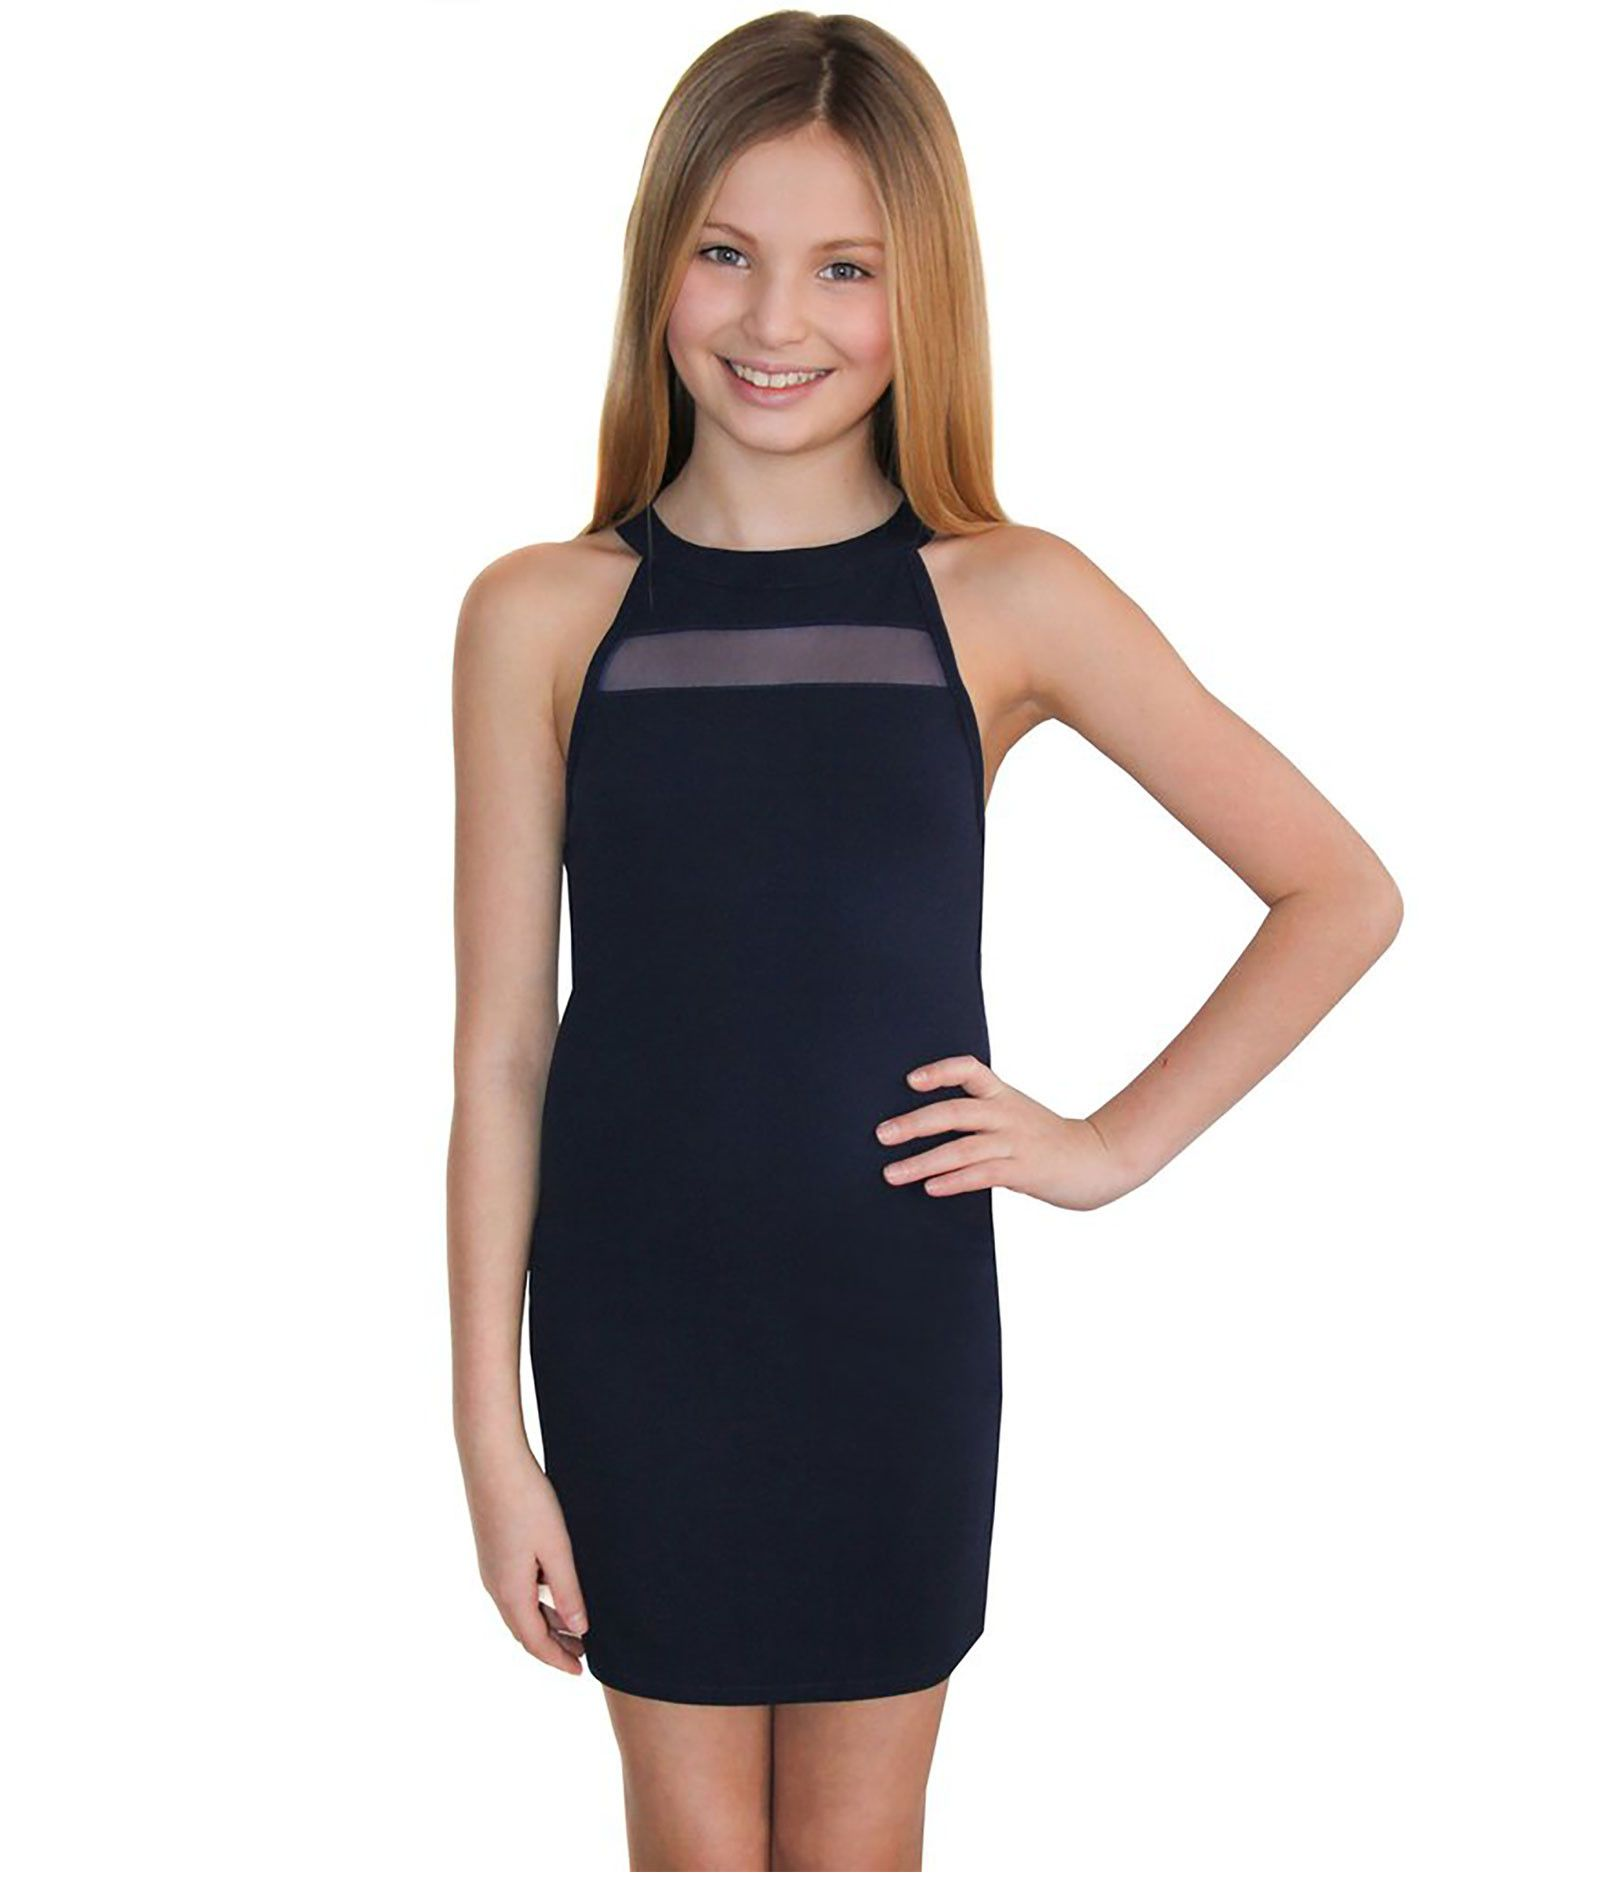 ecd4df1a30 Bodycon Dresses For Girls – Jerusalem House